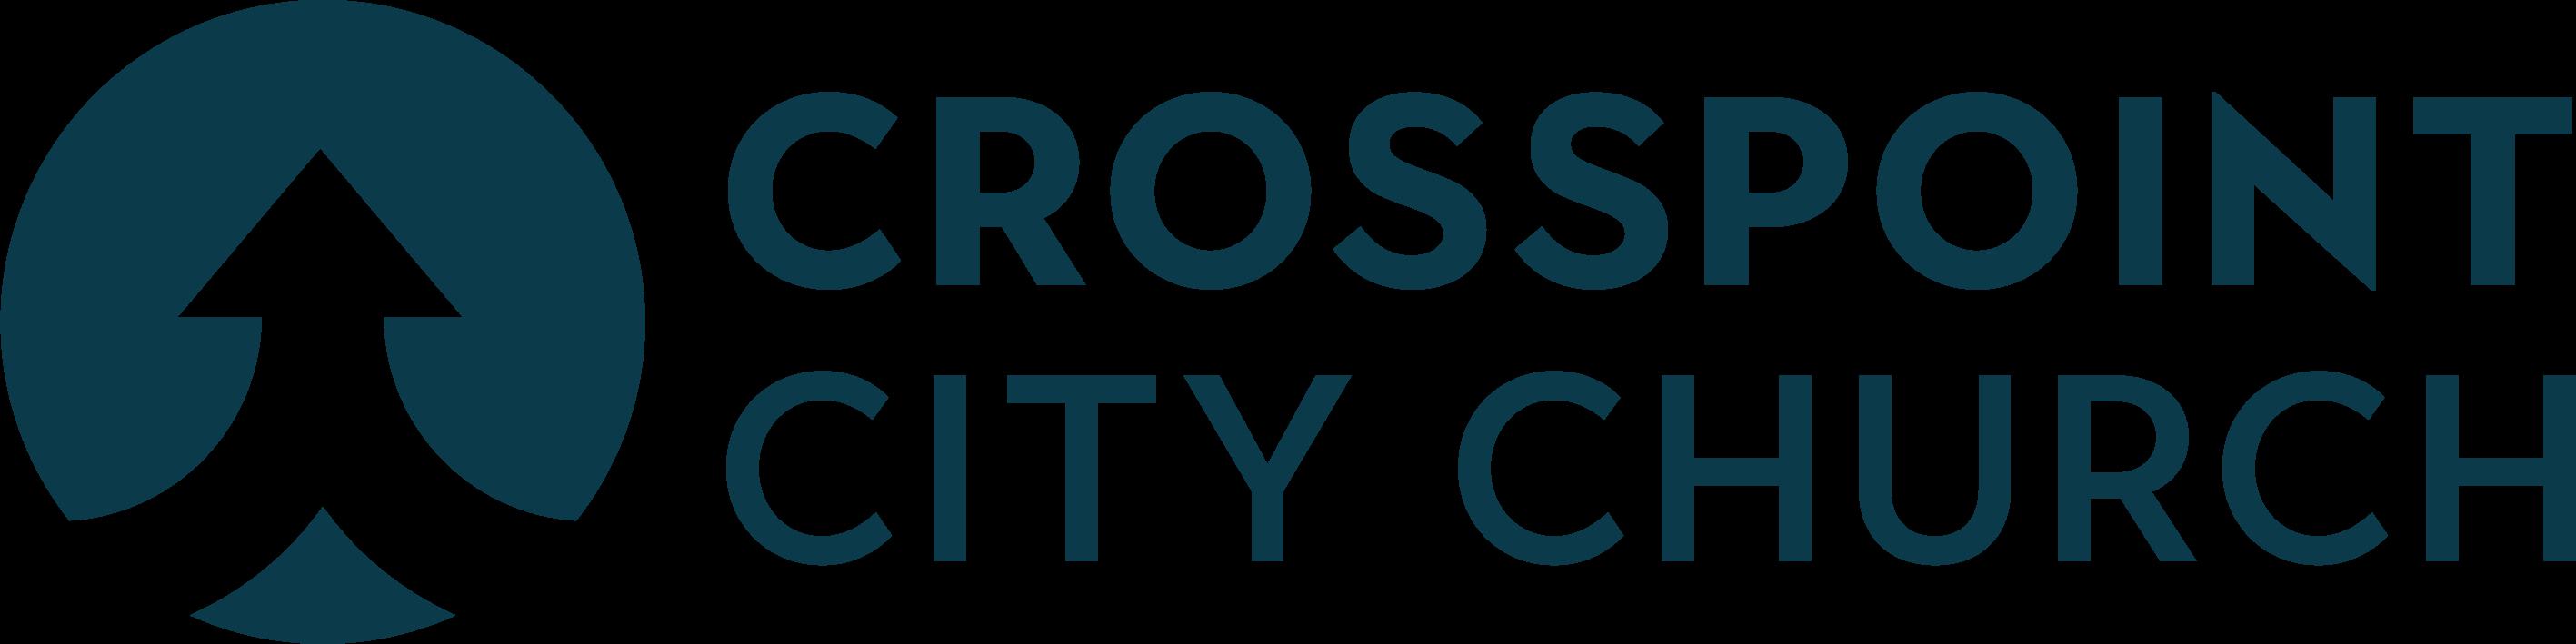 Crosspoint onecolor logo vector dkblue